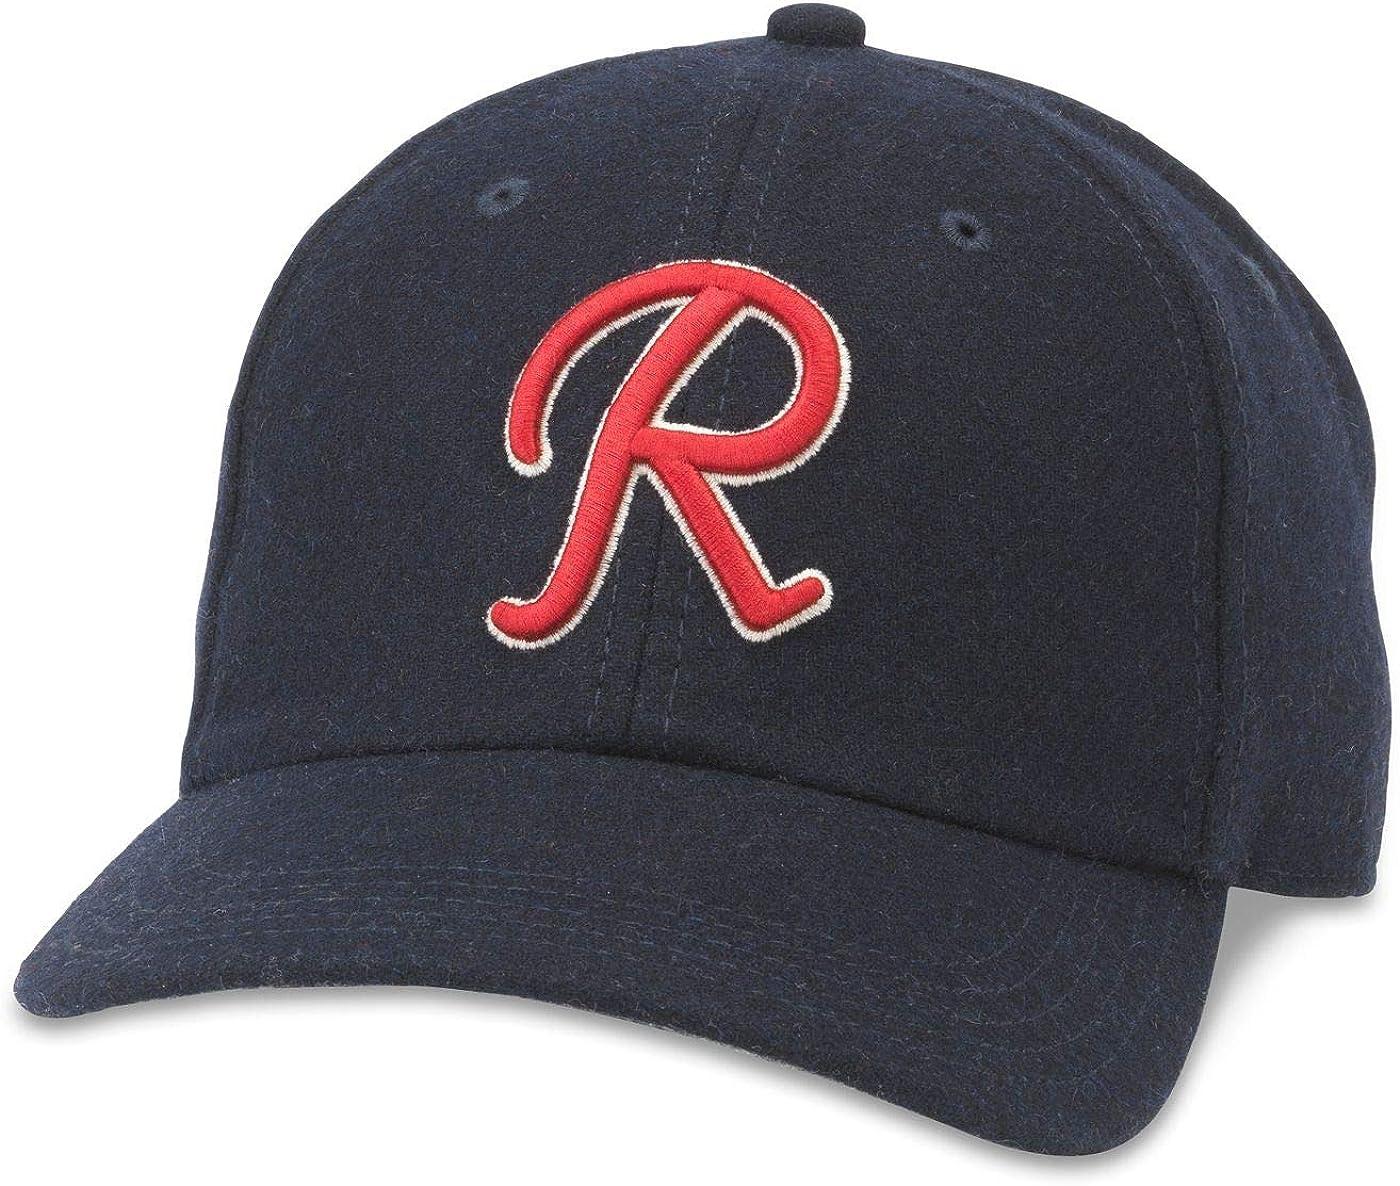 AMERICAN NEEDLE Archive Legend MiLB Baseball Team Adjustable Buckle Strap Dad Hat